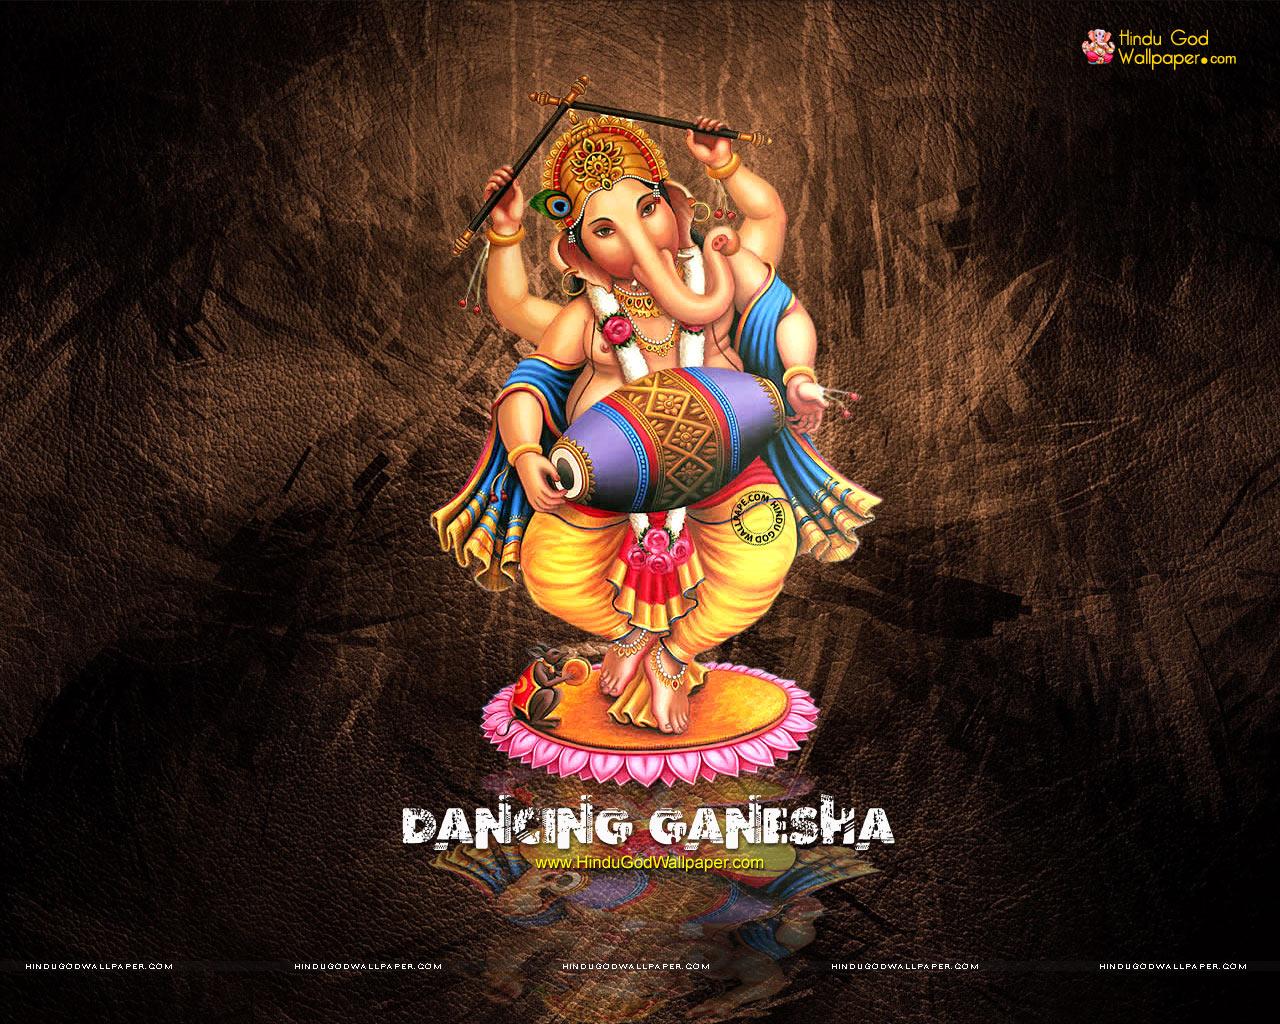 dancing ganesha picturesjpg - photo #14